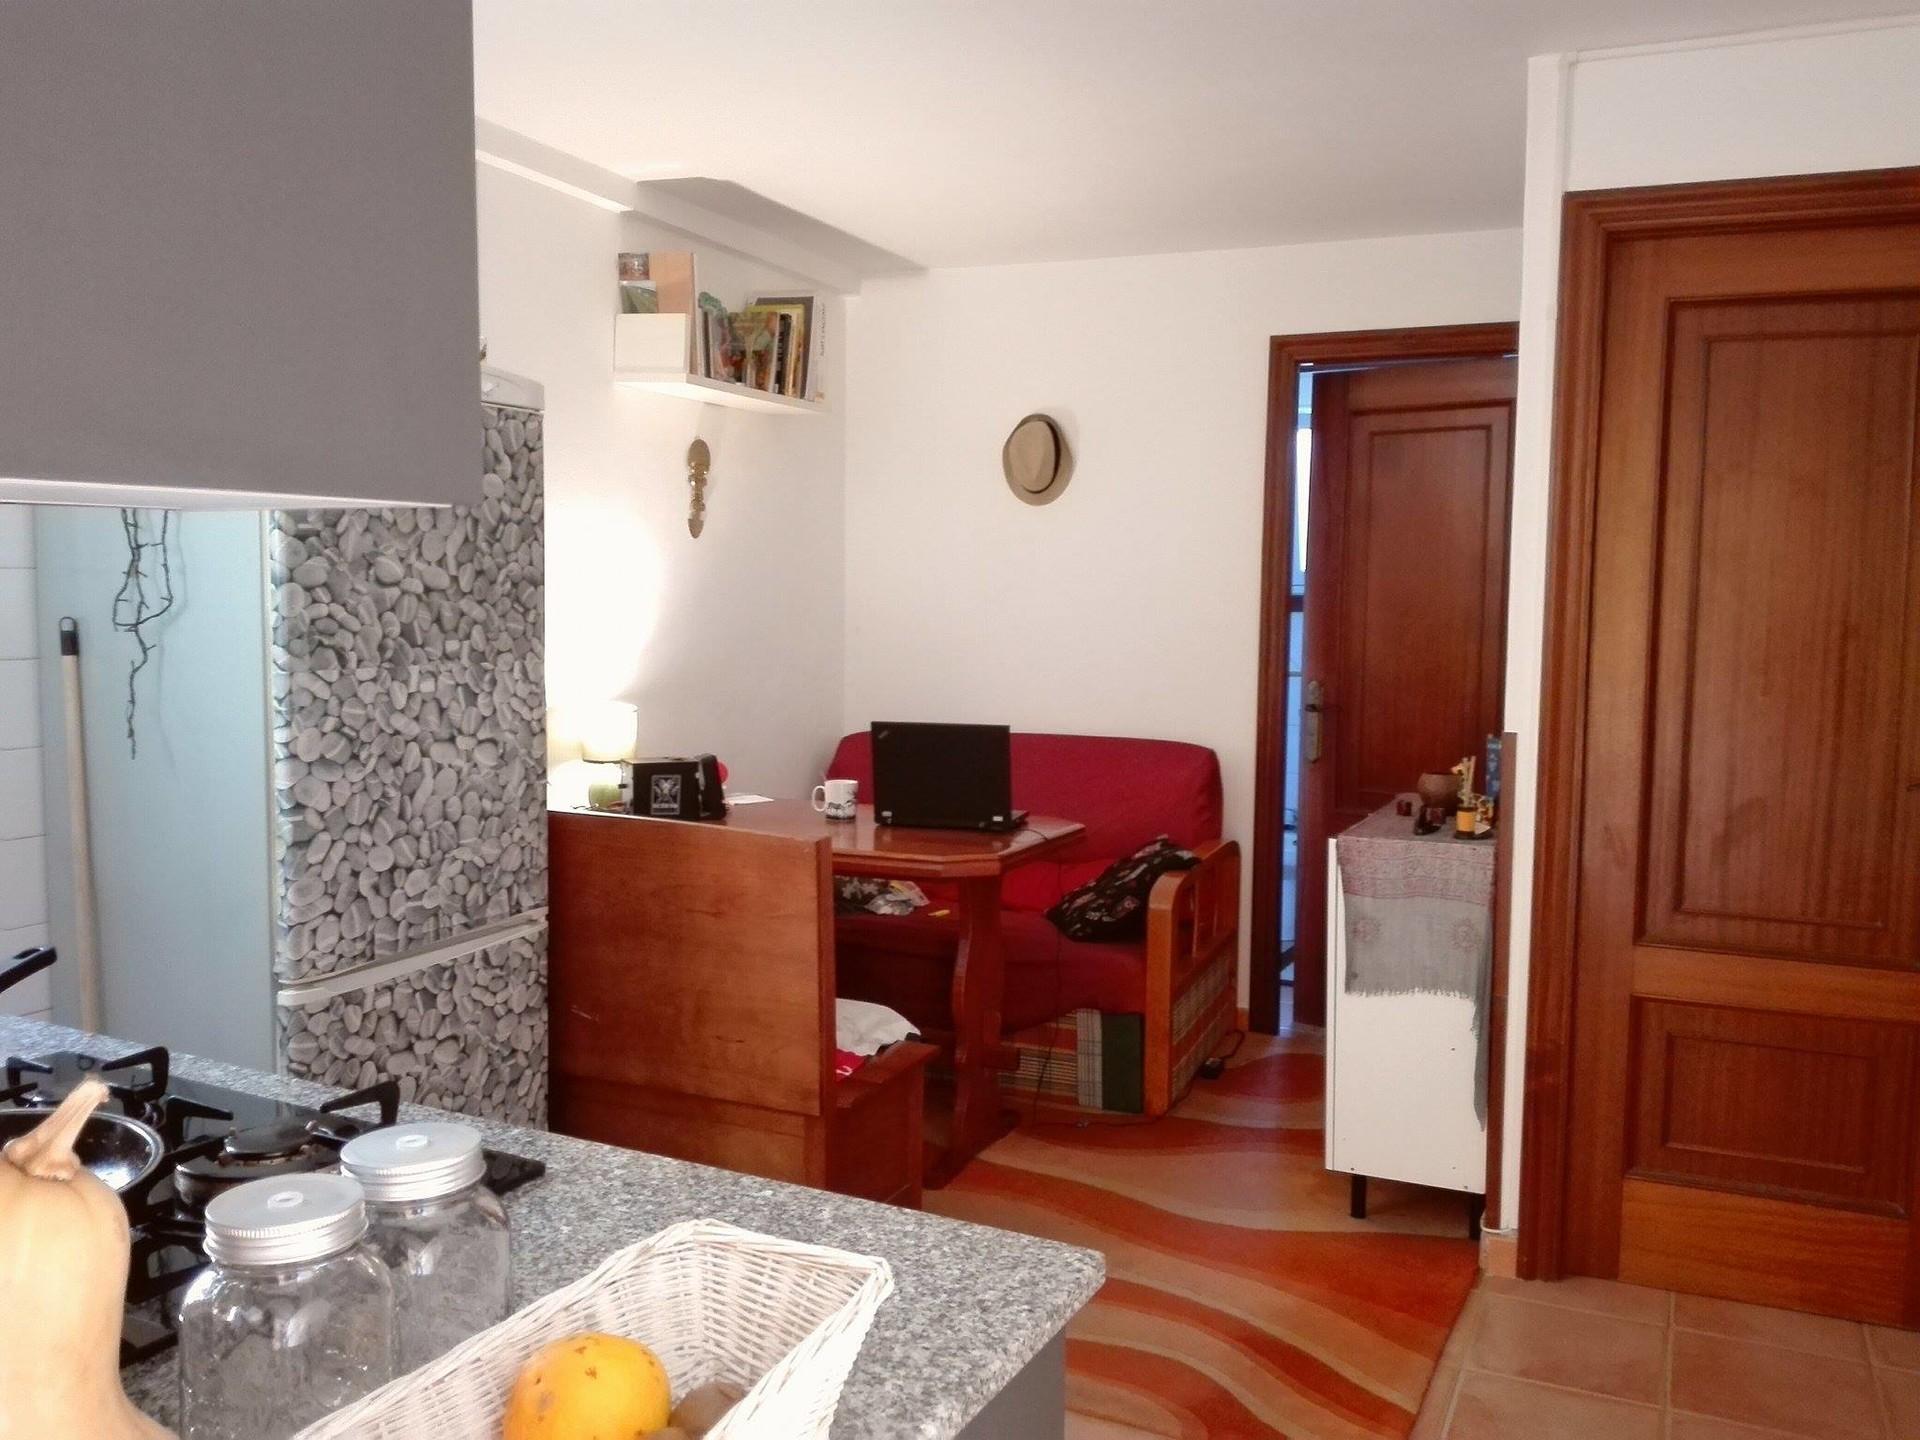 habitacion-casa-cerca-playa-4d3187946161